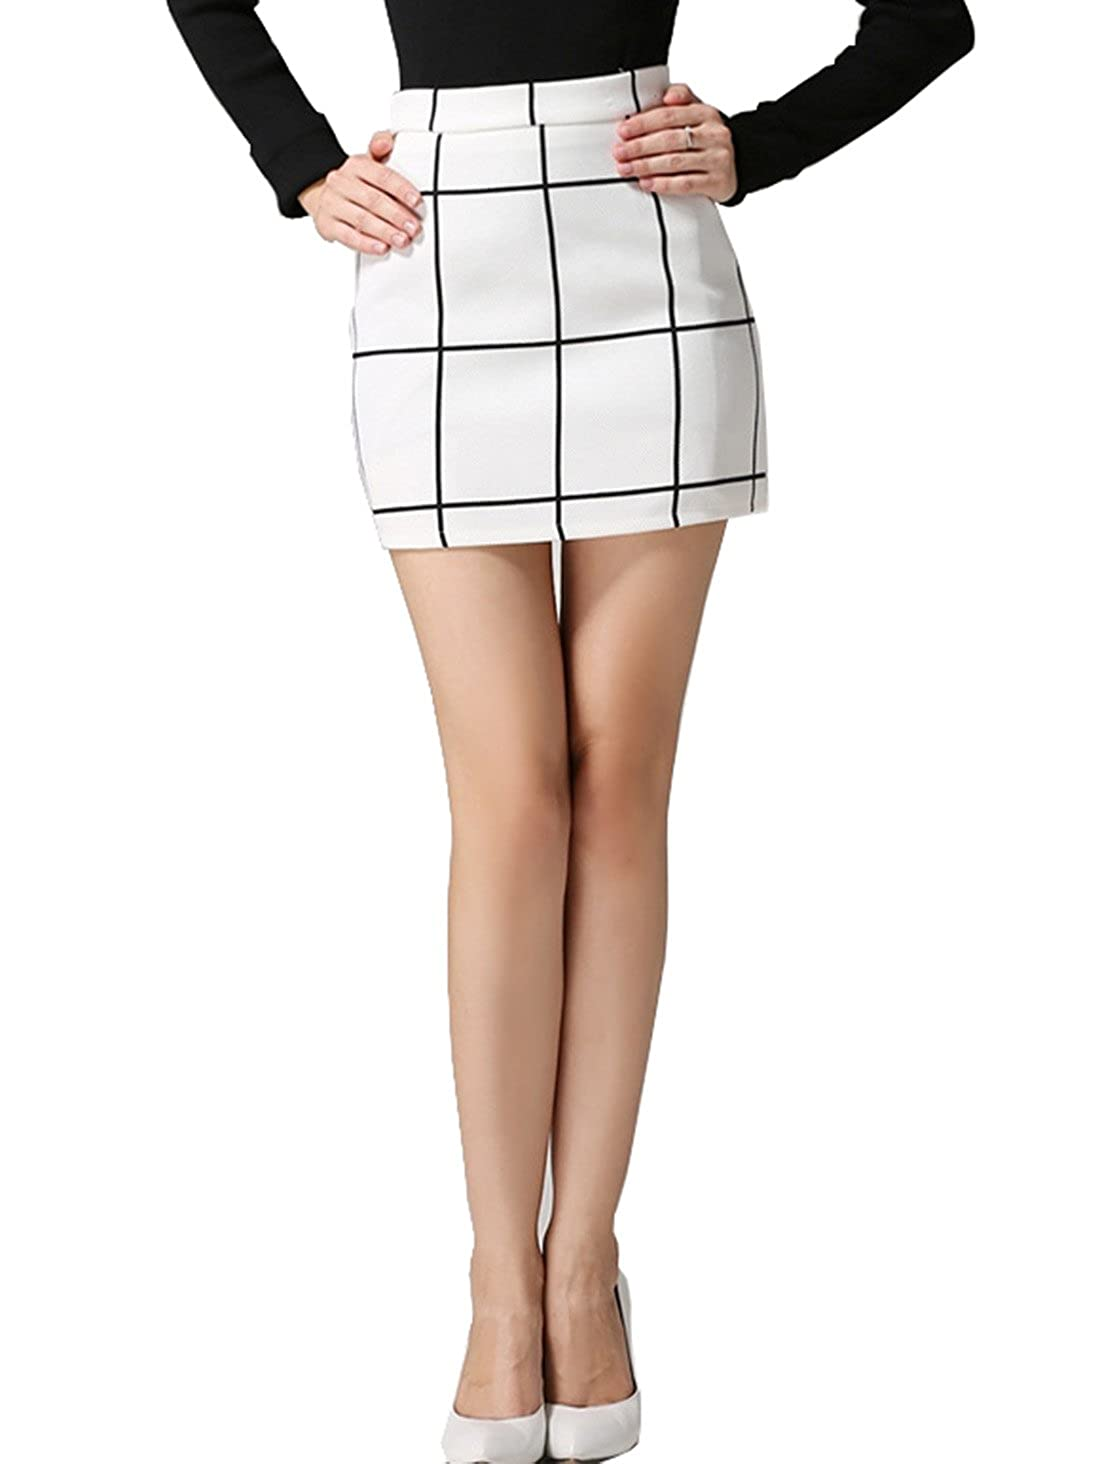 b8bffc33e3 Amazon.com: SheIn Women's Plaid Bodycon Mini Skirt - White Large: Clothing